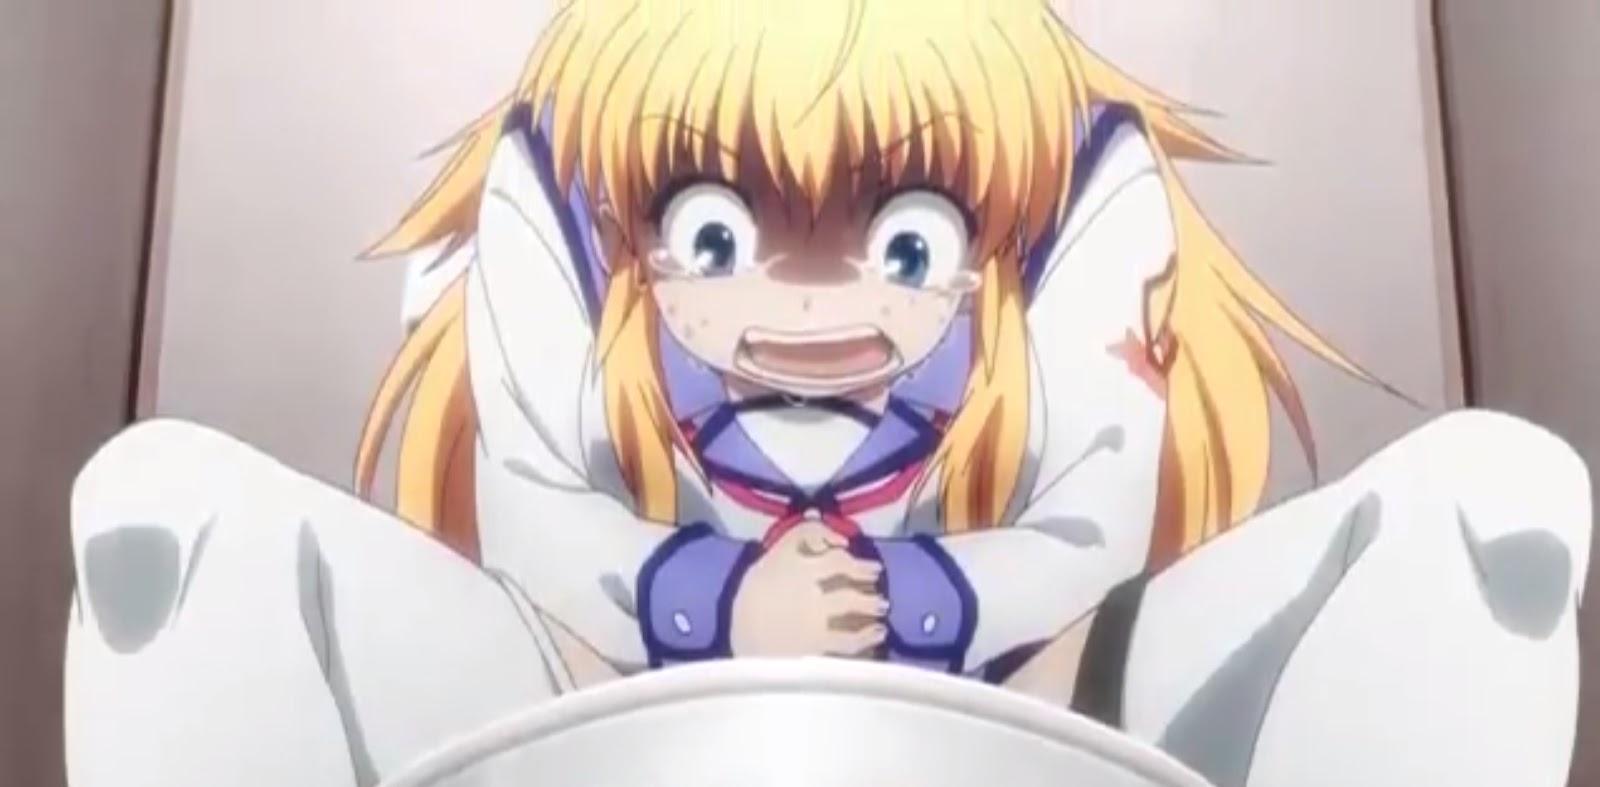 Assistir Angel Beats!, Angel Beats! - OVA 02, Angel Beats!, HD, Angel Beats! - OVA 02, Angel Beats! - OVA 02, Angel Beats! - Episódio 02